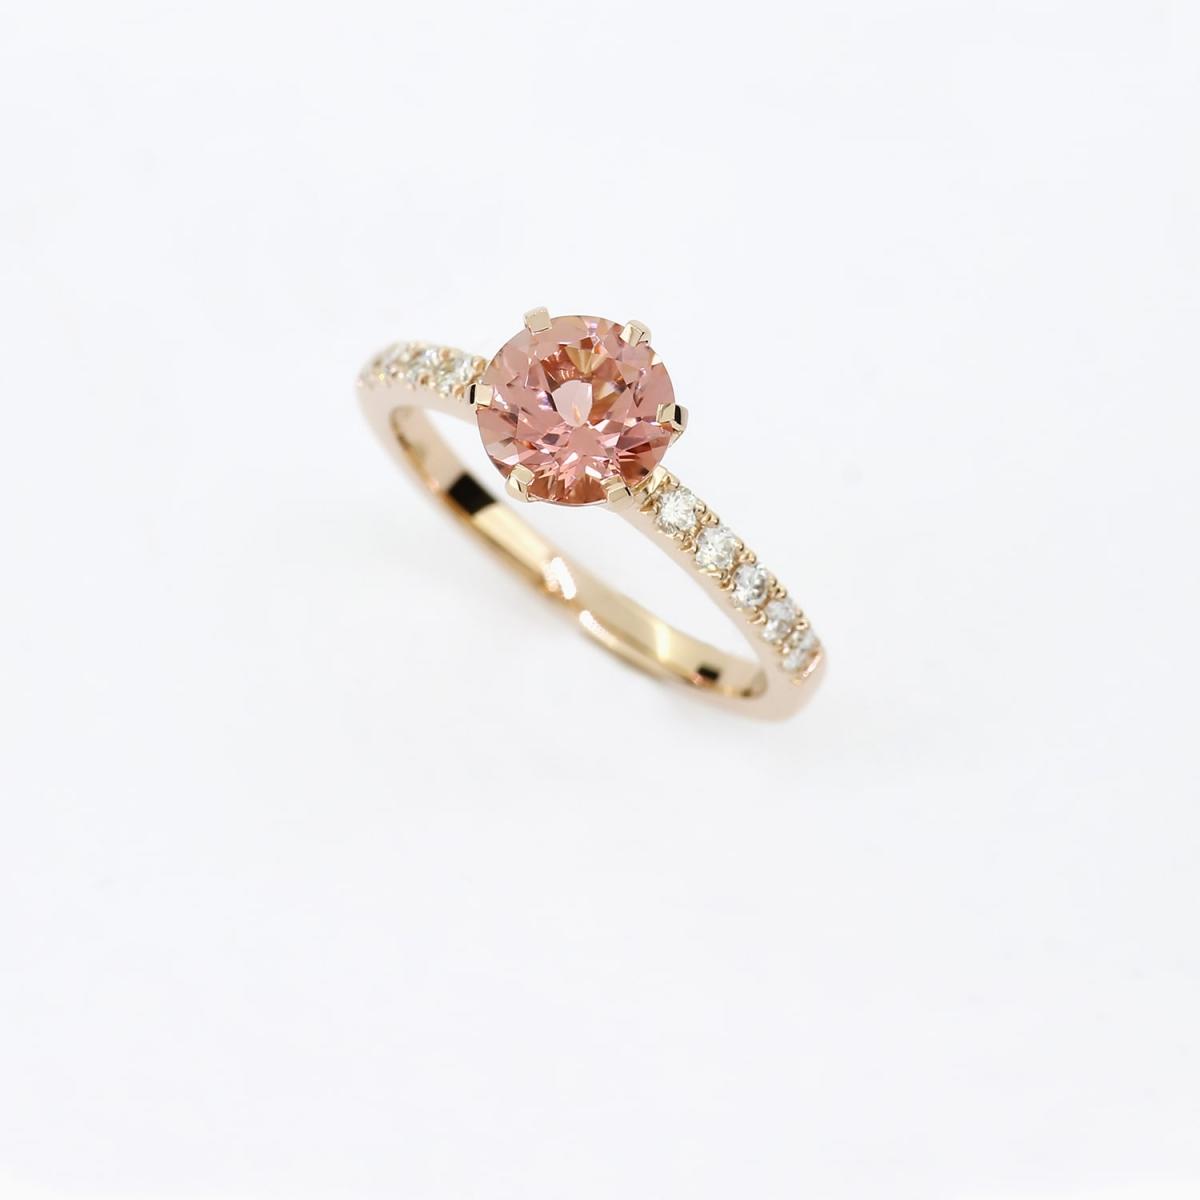 Sormus Vaaleanpunainen Kivi - erva-cidreira.info 24f72dfbe8